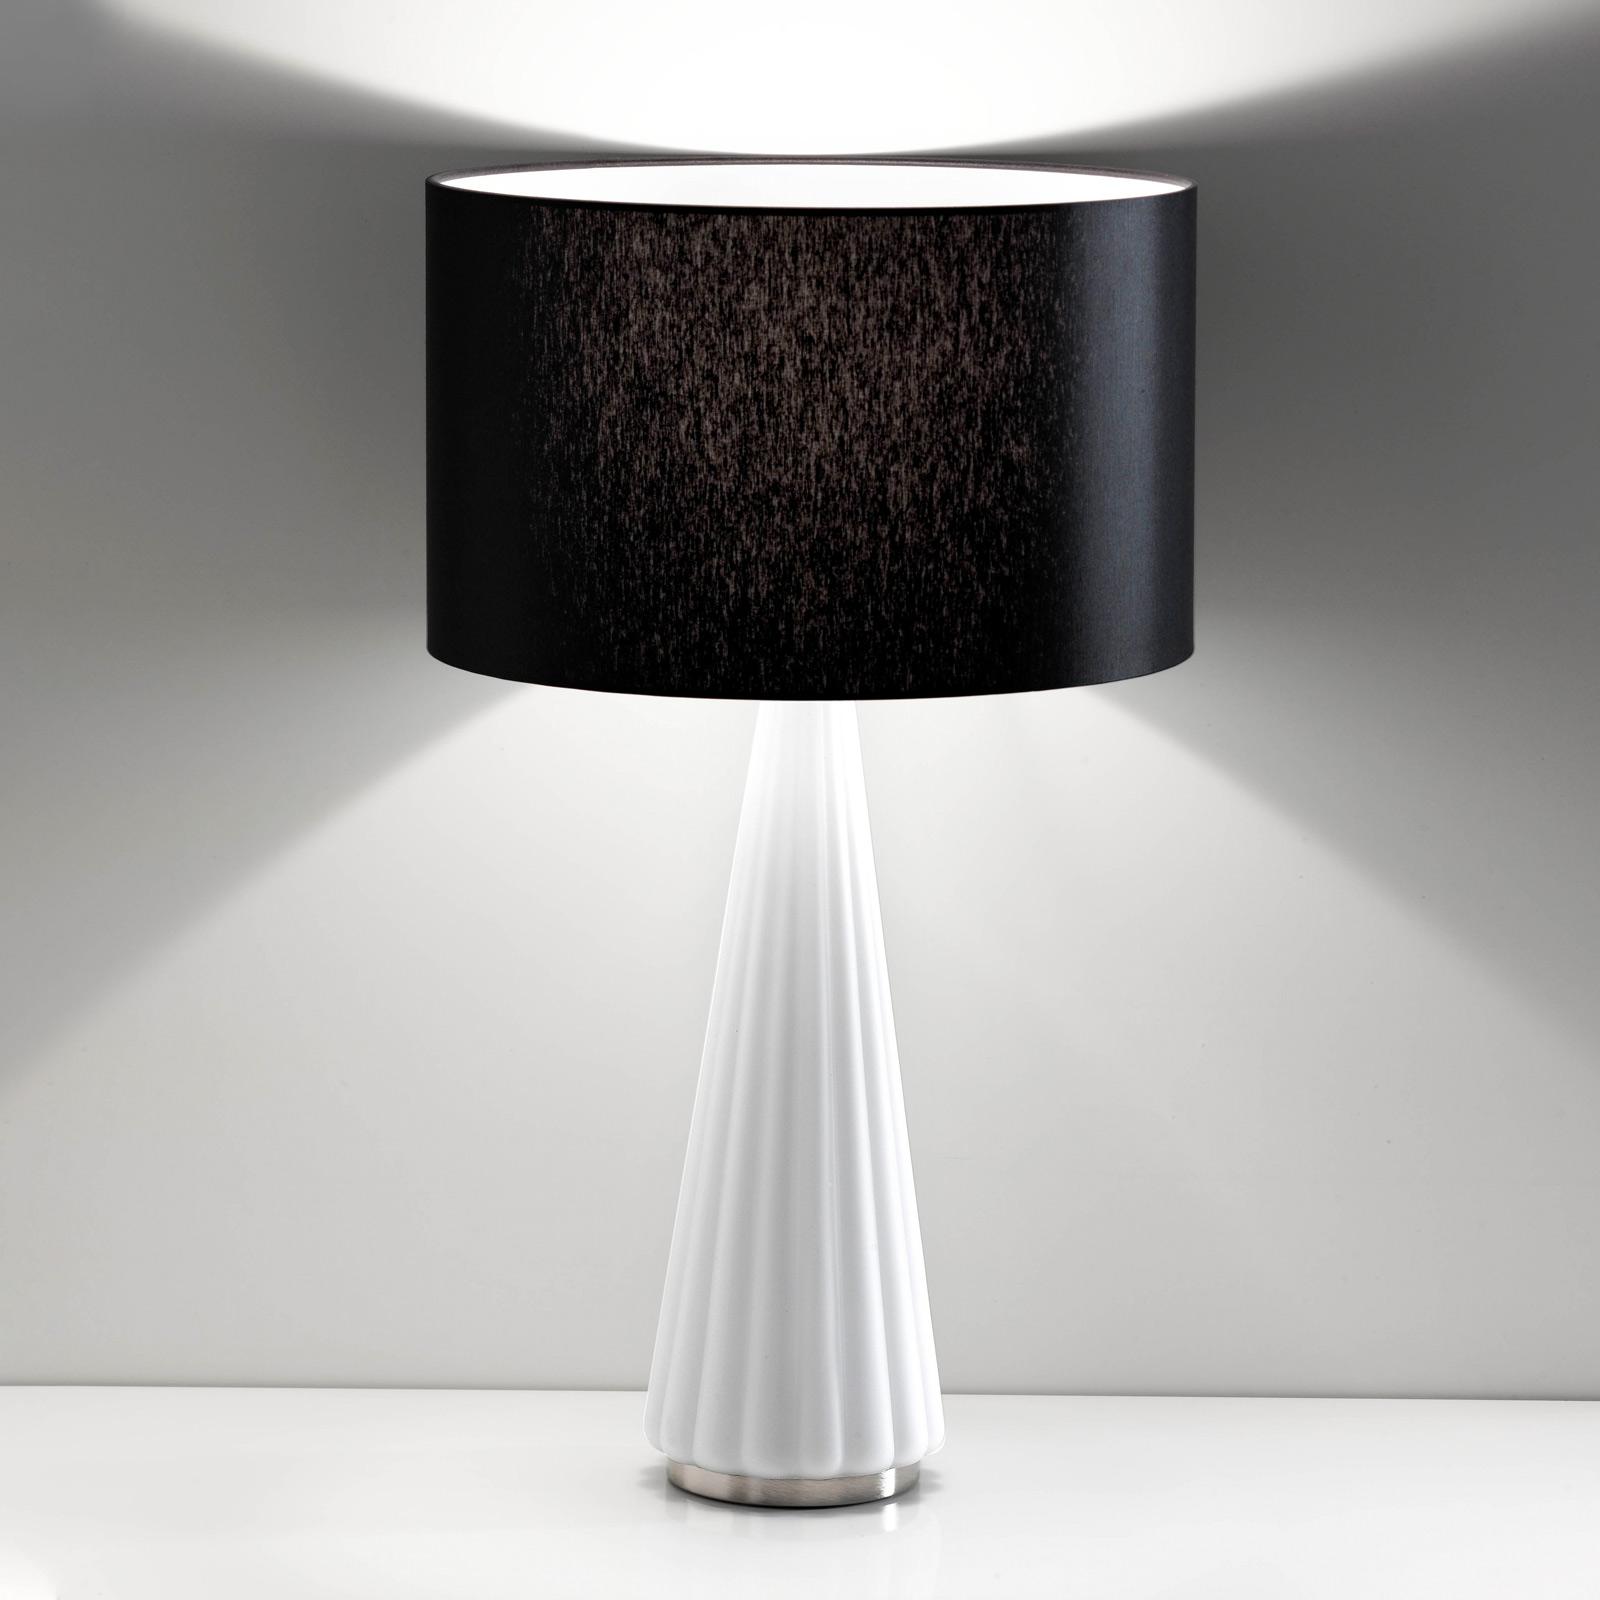 Lámpara de mesa Costa Rica tulipa negra pie blanco